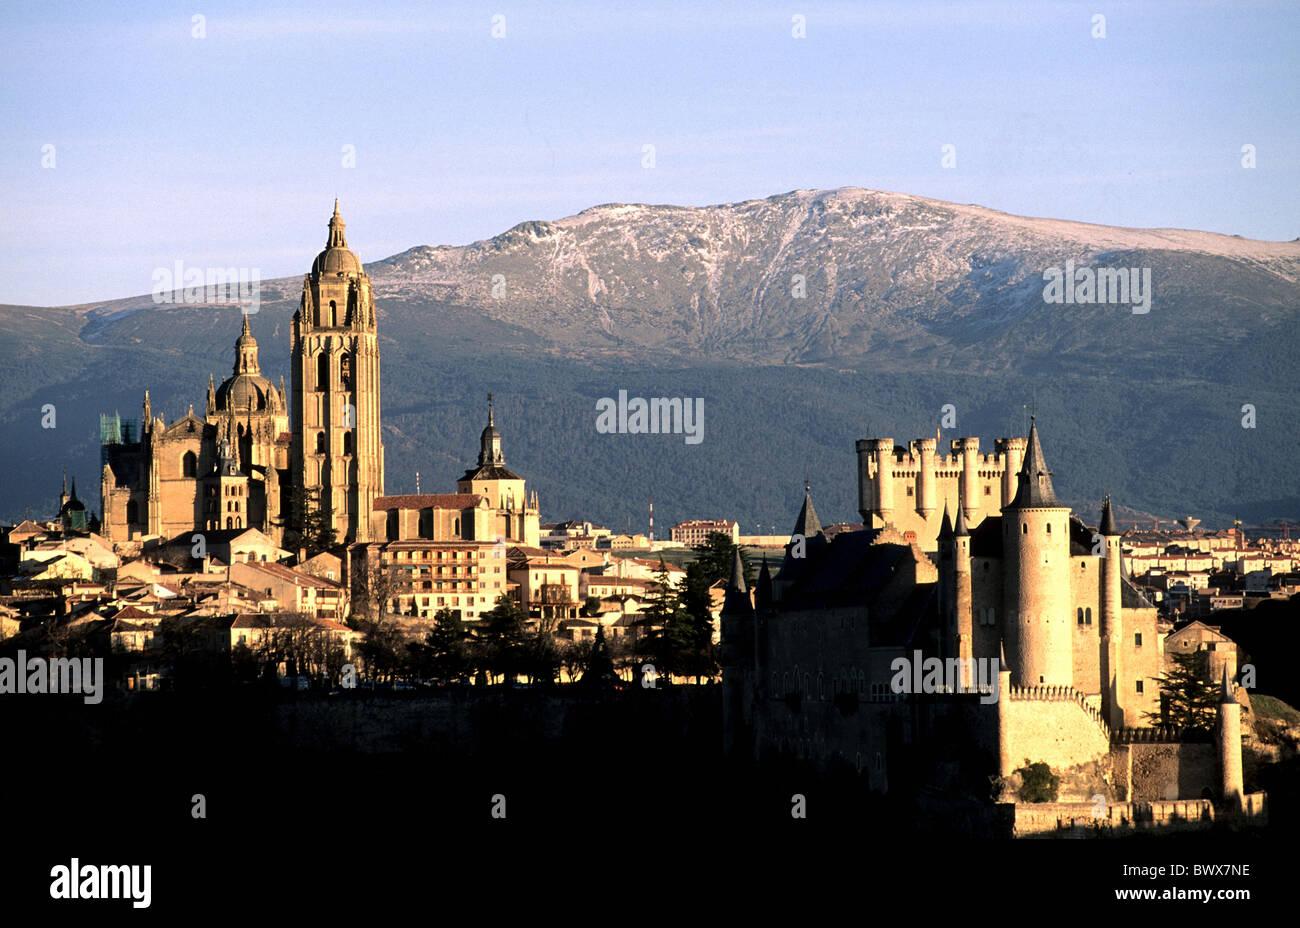 Spain Europe Segovia overview evening mood Sierra de Guadarrama mountains Stock Photo